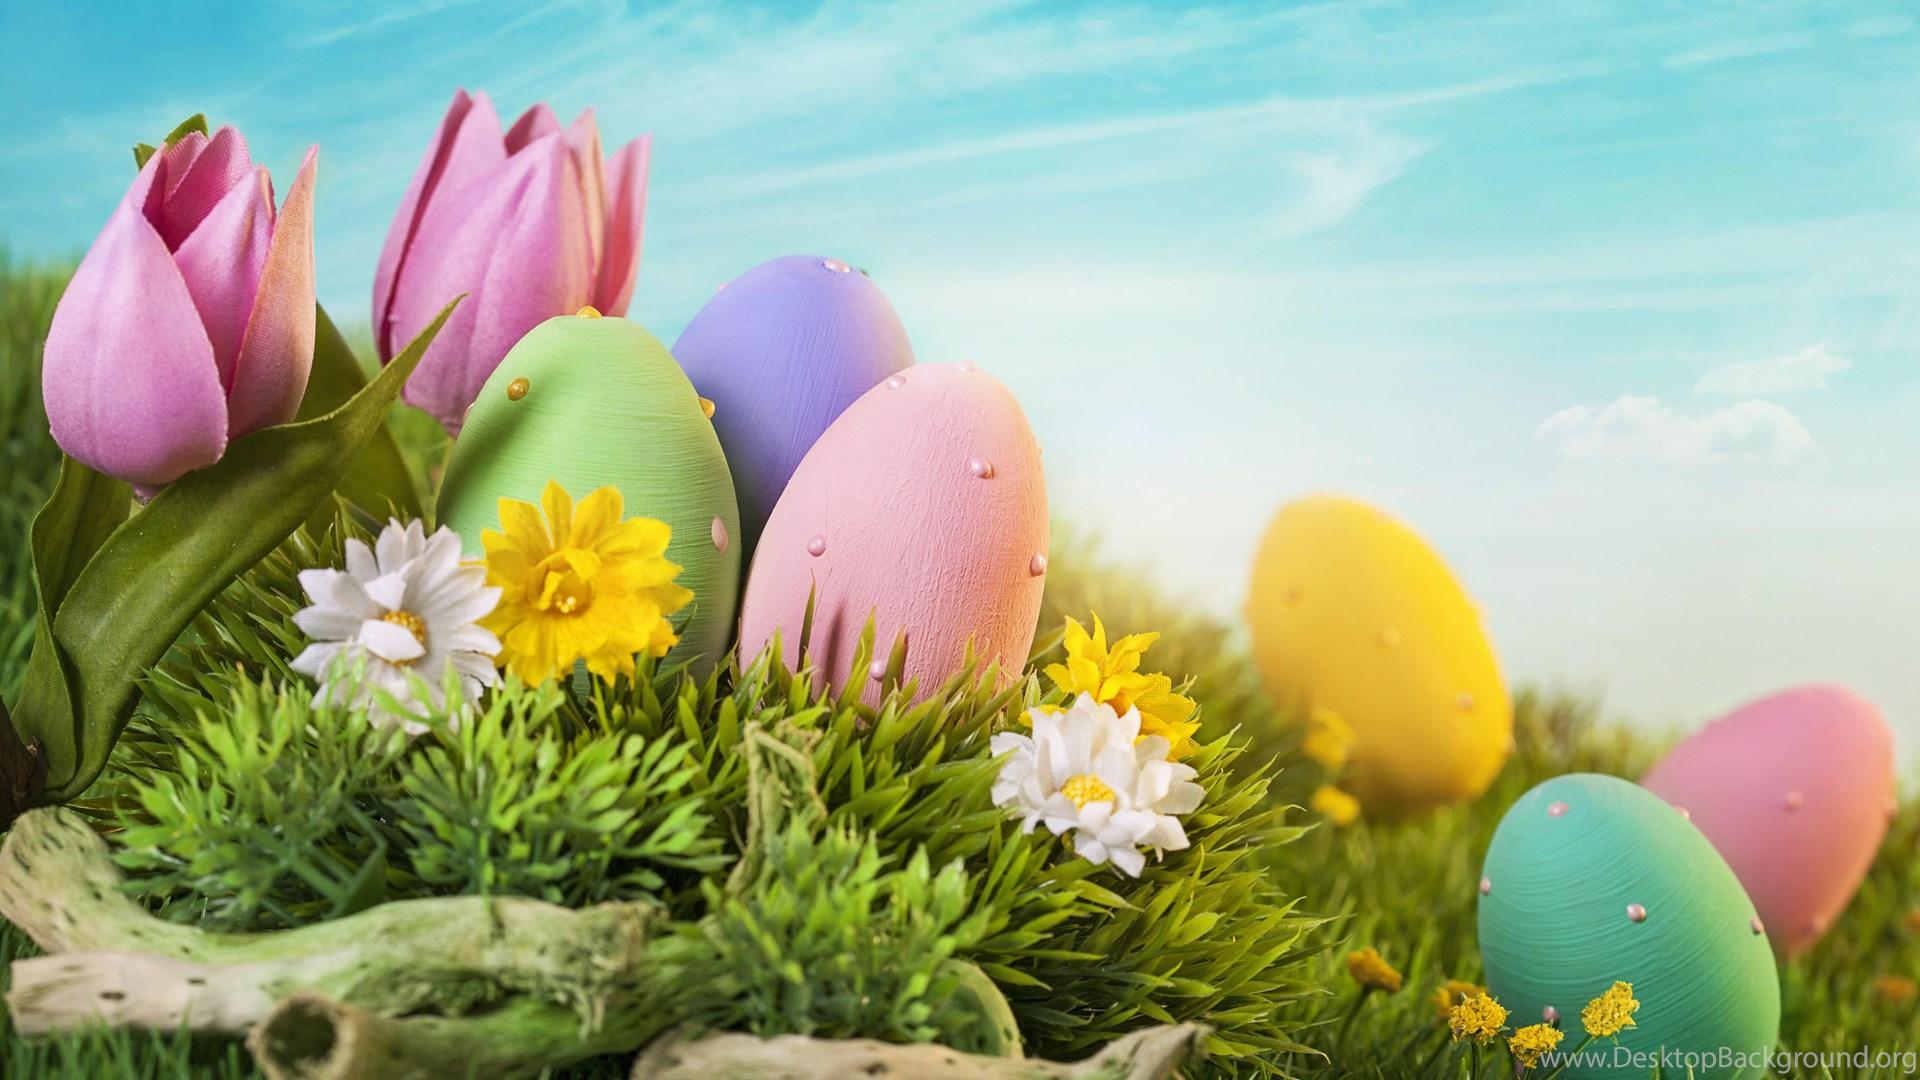 Happy easter wallpaper desktop background - Easter desktop wallpaper ...